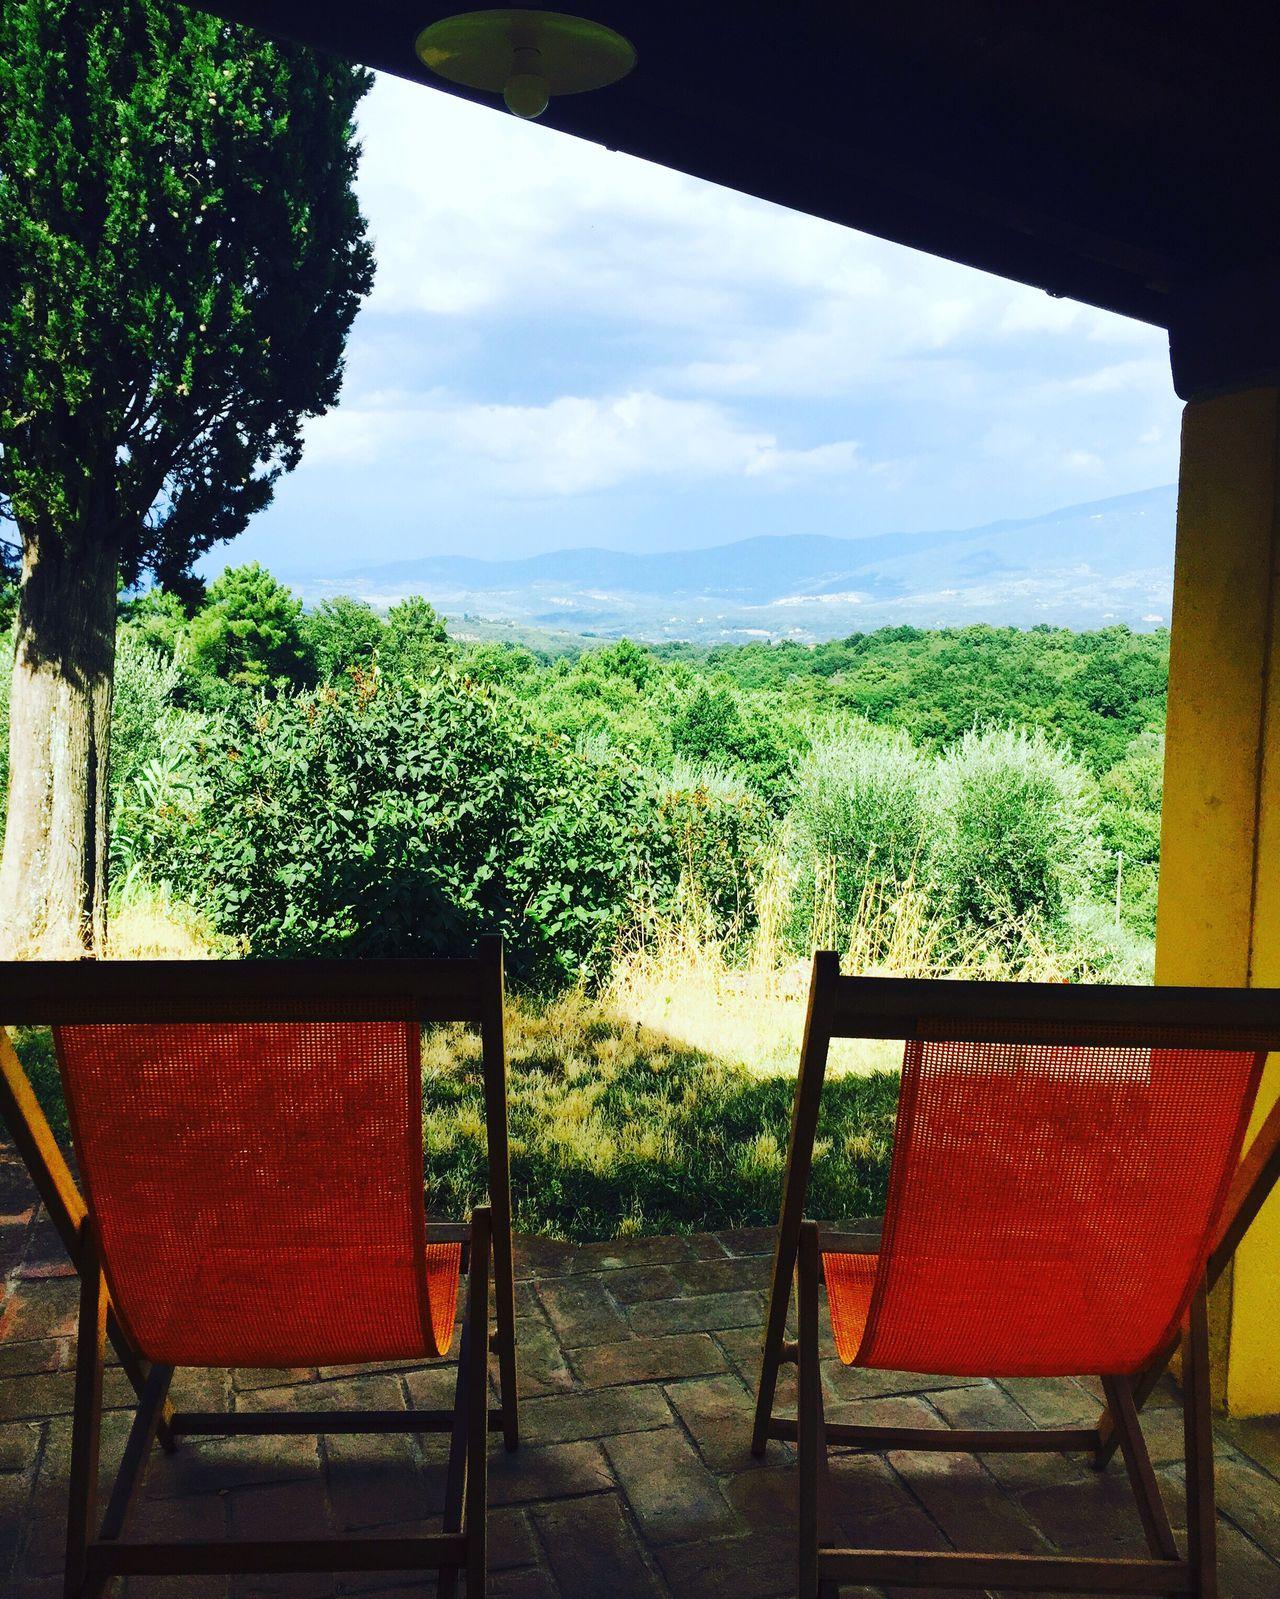 Tuscany Italy Poderacciofarm Organicfarm View Farmstay Deckchairs Summer Relaxing EyeEmNewHere